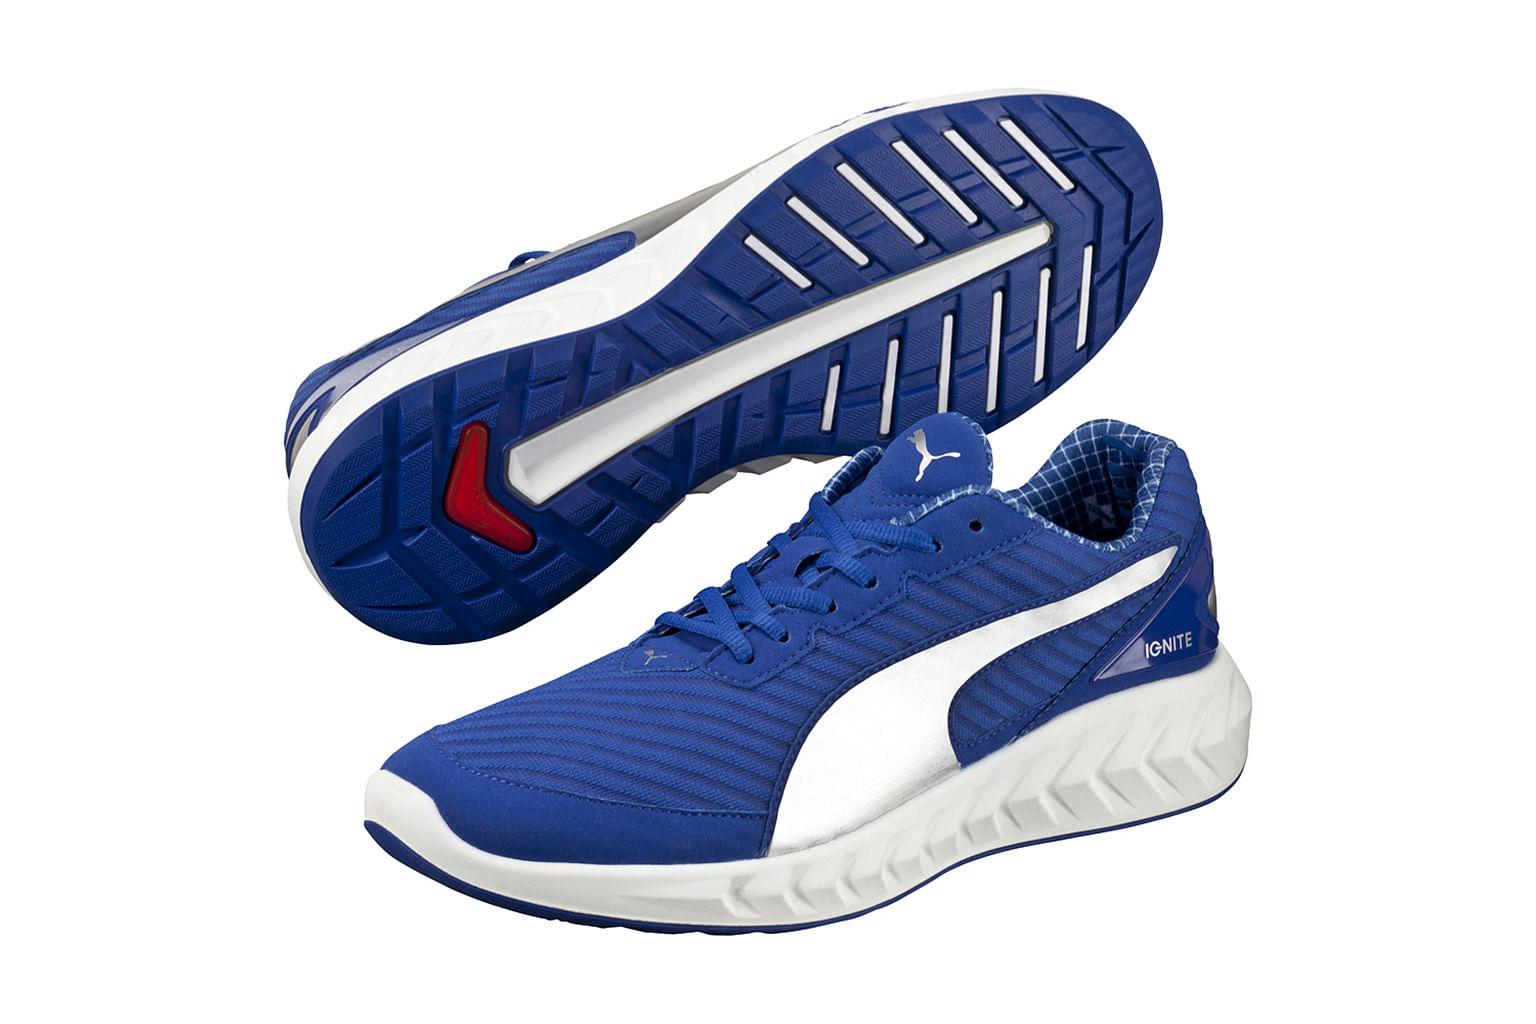 8b29b05251111d New running shoes Ignite Ultimate comfort